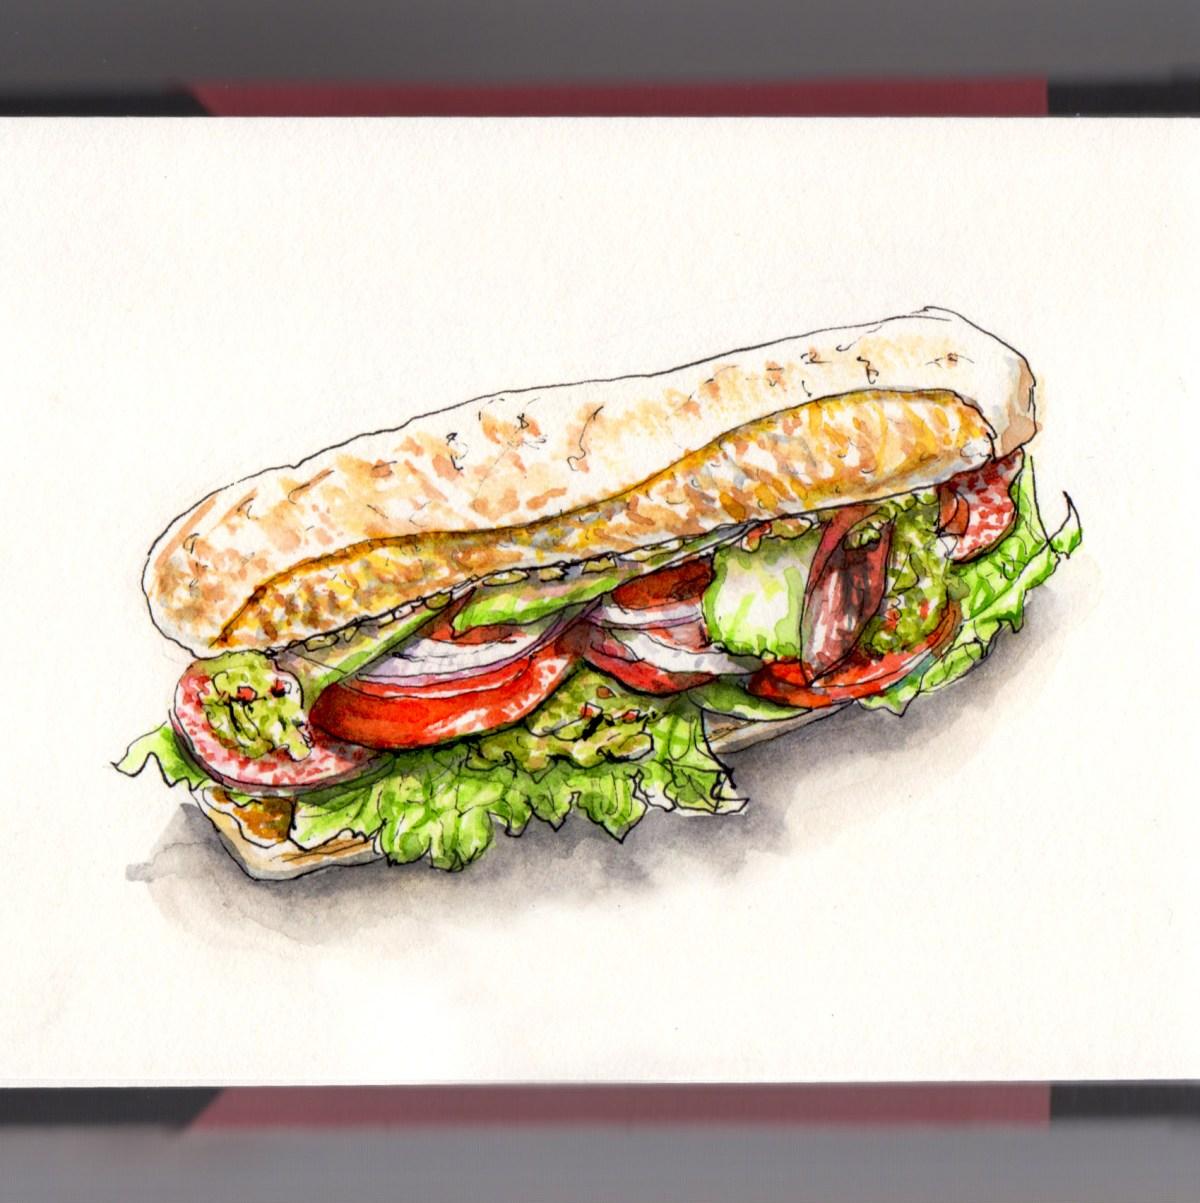 Day 3 - #WorldWatercolorGroup National Sandwich Day Submarine Sandwich Hoagie